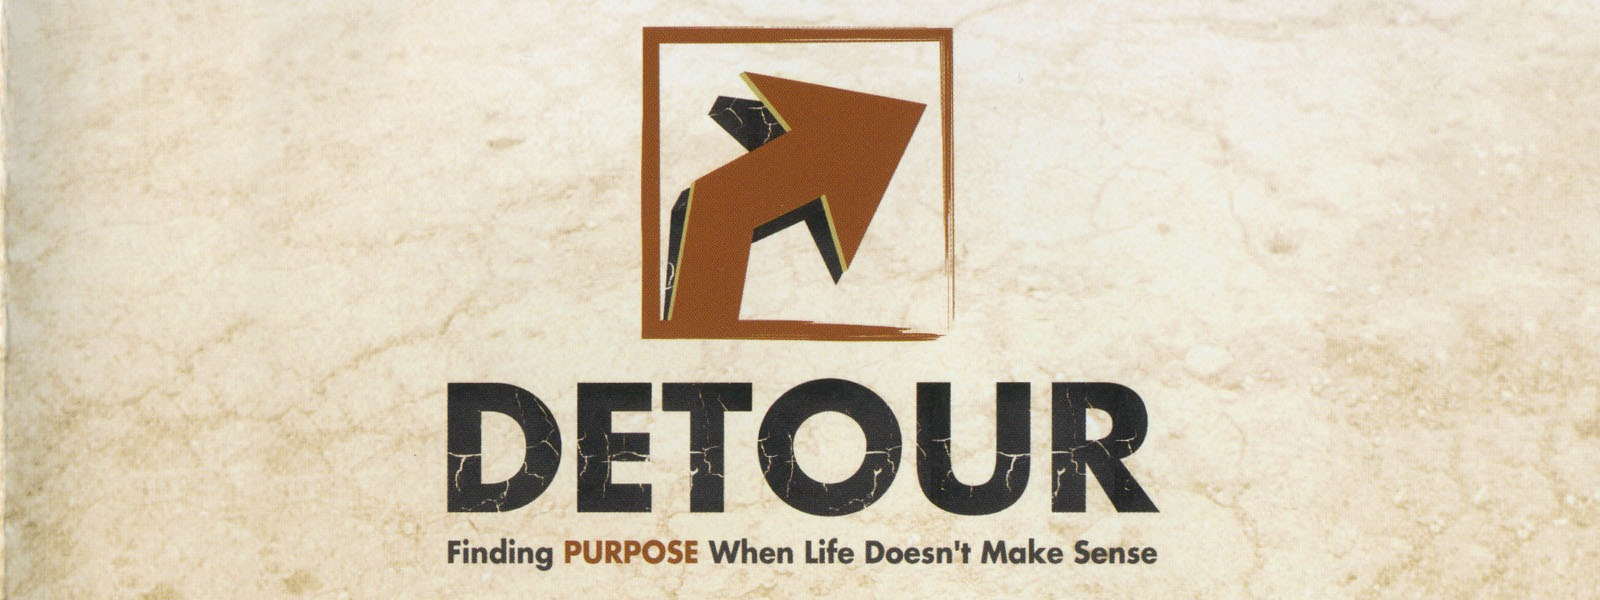 DETOUR: FINDING PURPOSE WHEN LIFE DOESN'T MAKE SENSE – PHIL TUTTLE